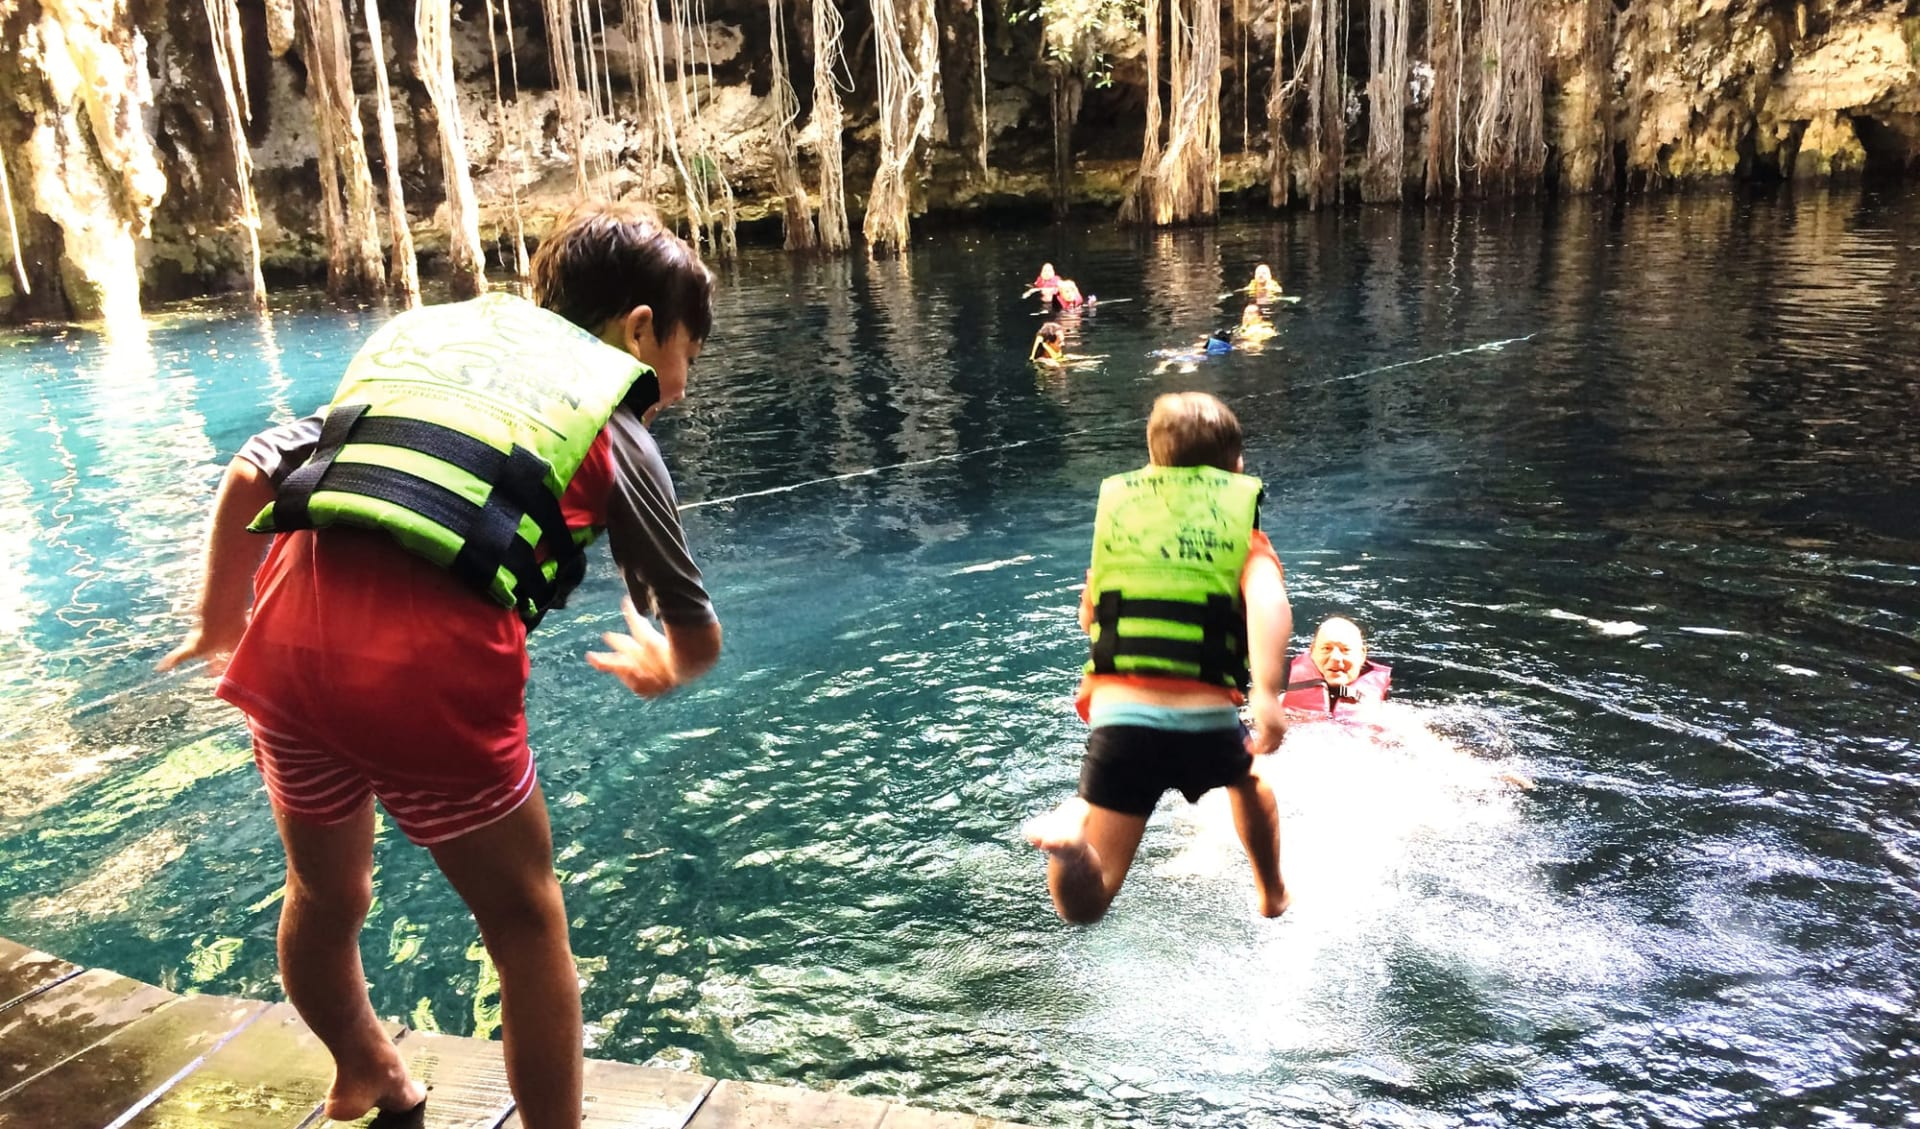 Yucatán Familienreise ab Cancun: Mexico - Yucatan - Kinder Wasserfall